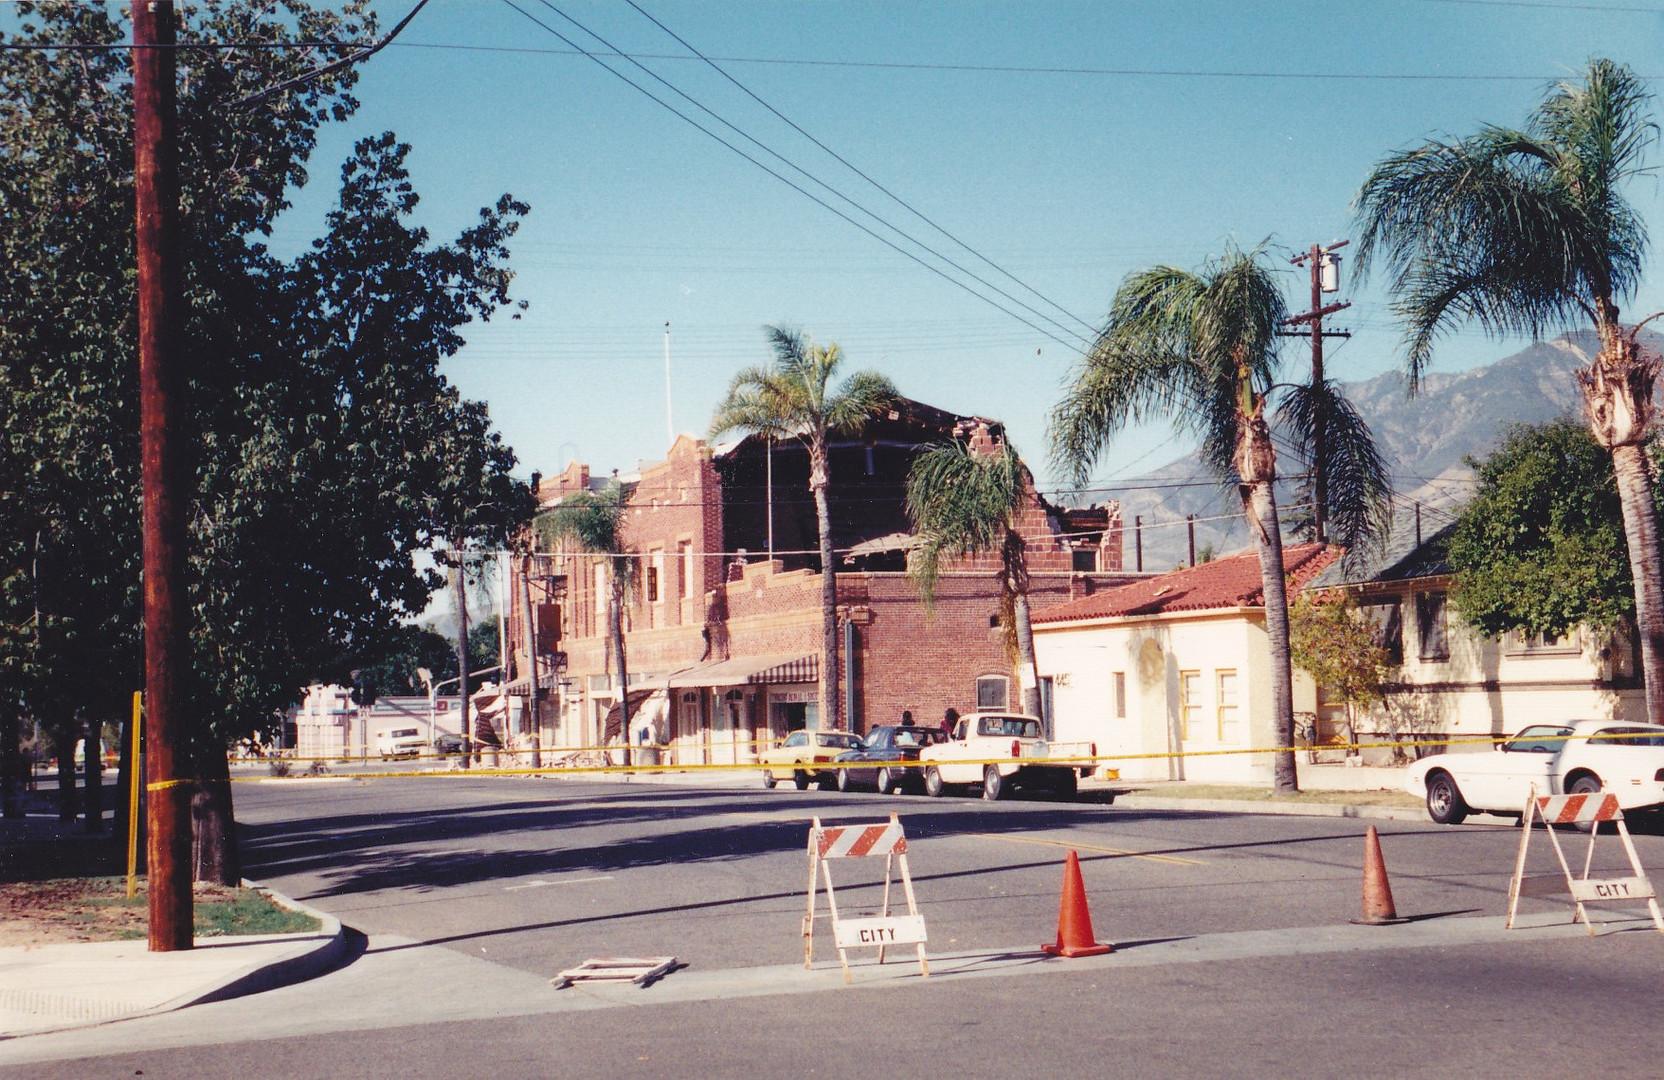 1994 Earthquake, Looking West on Sespe